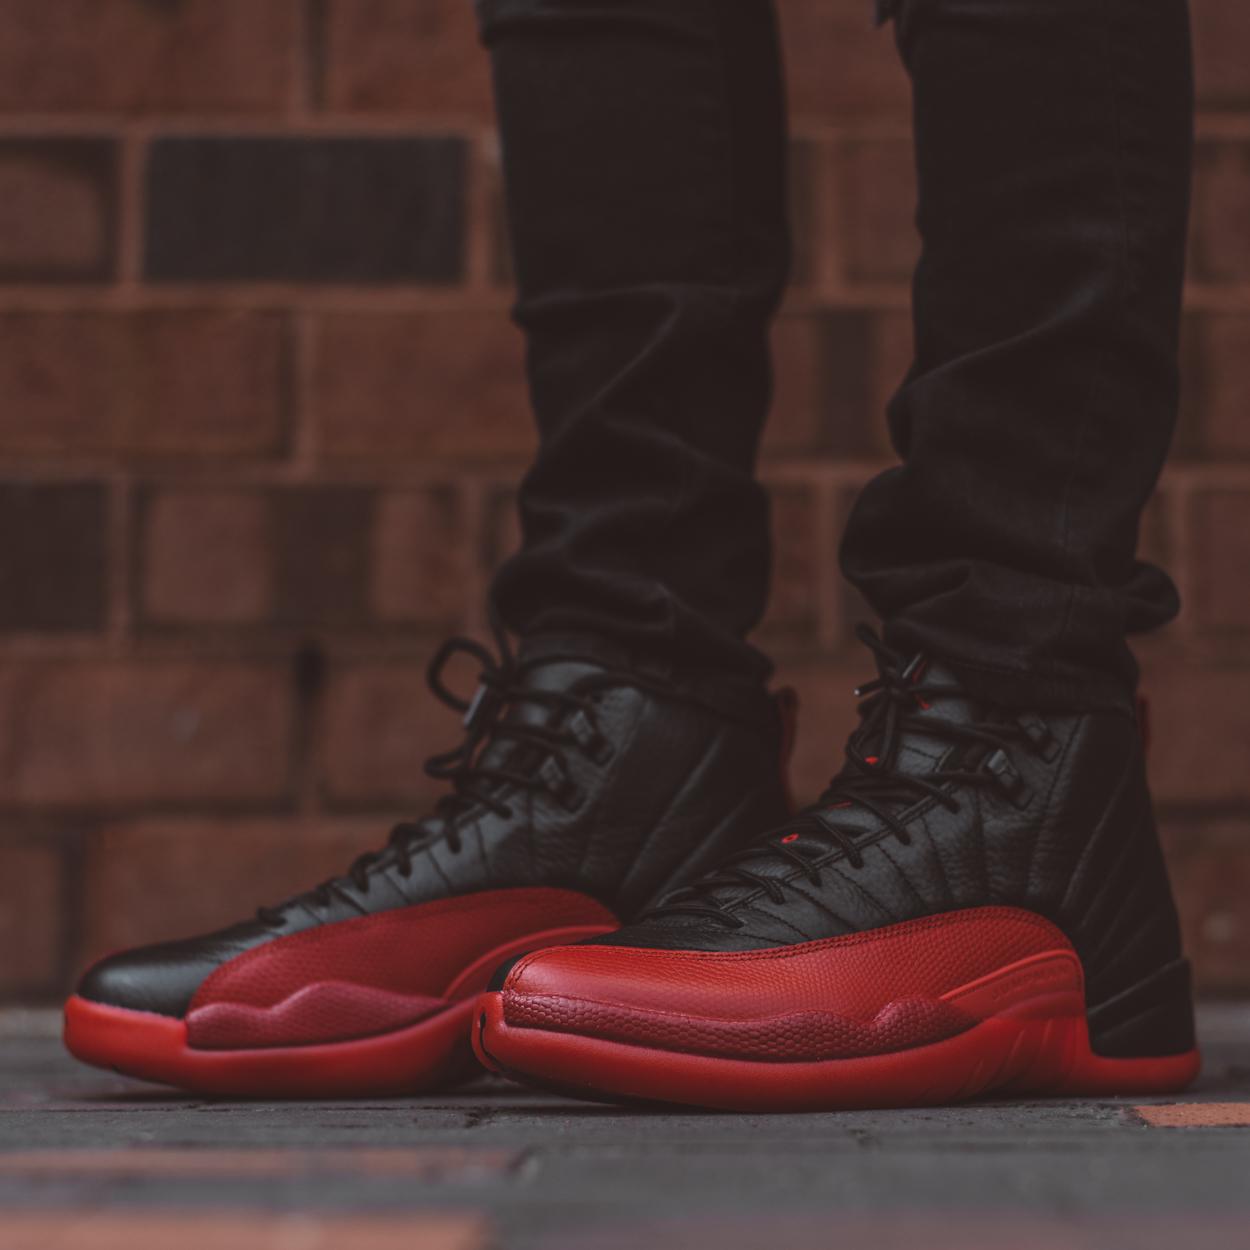 17d5ea1edd5dfe Nike Air Jordan 12 Taxi